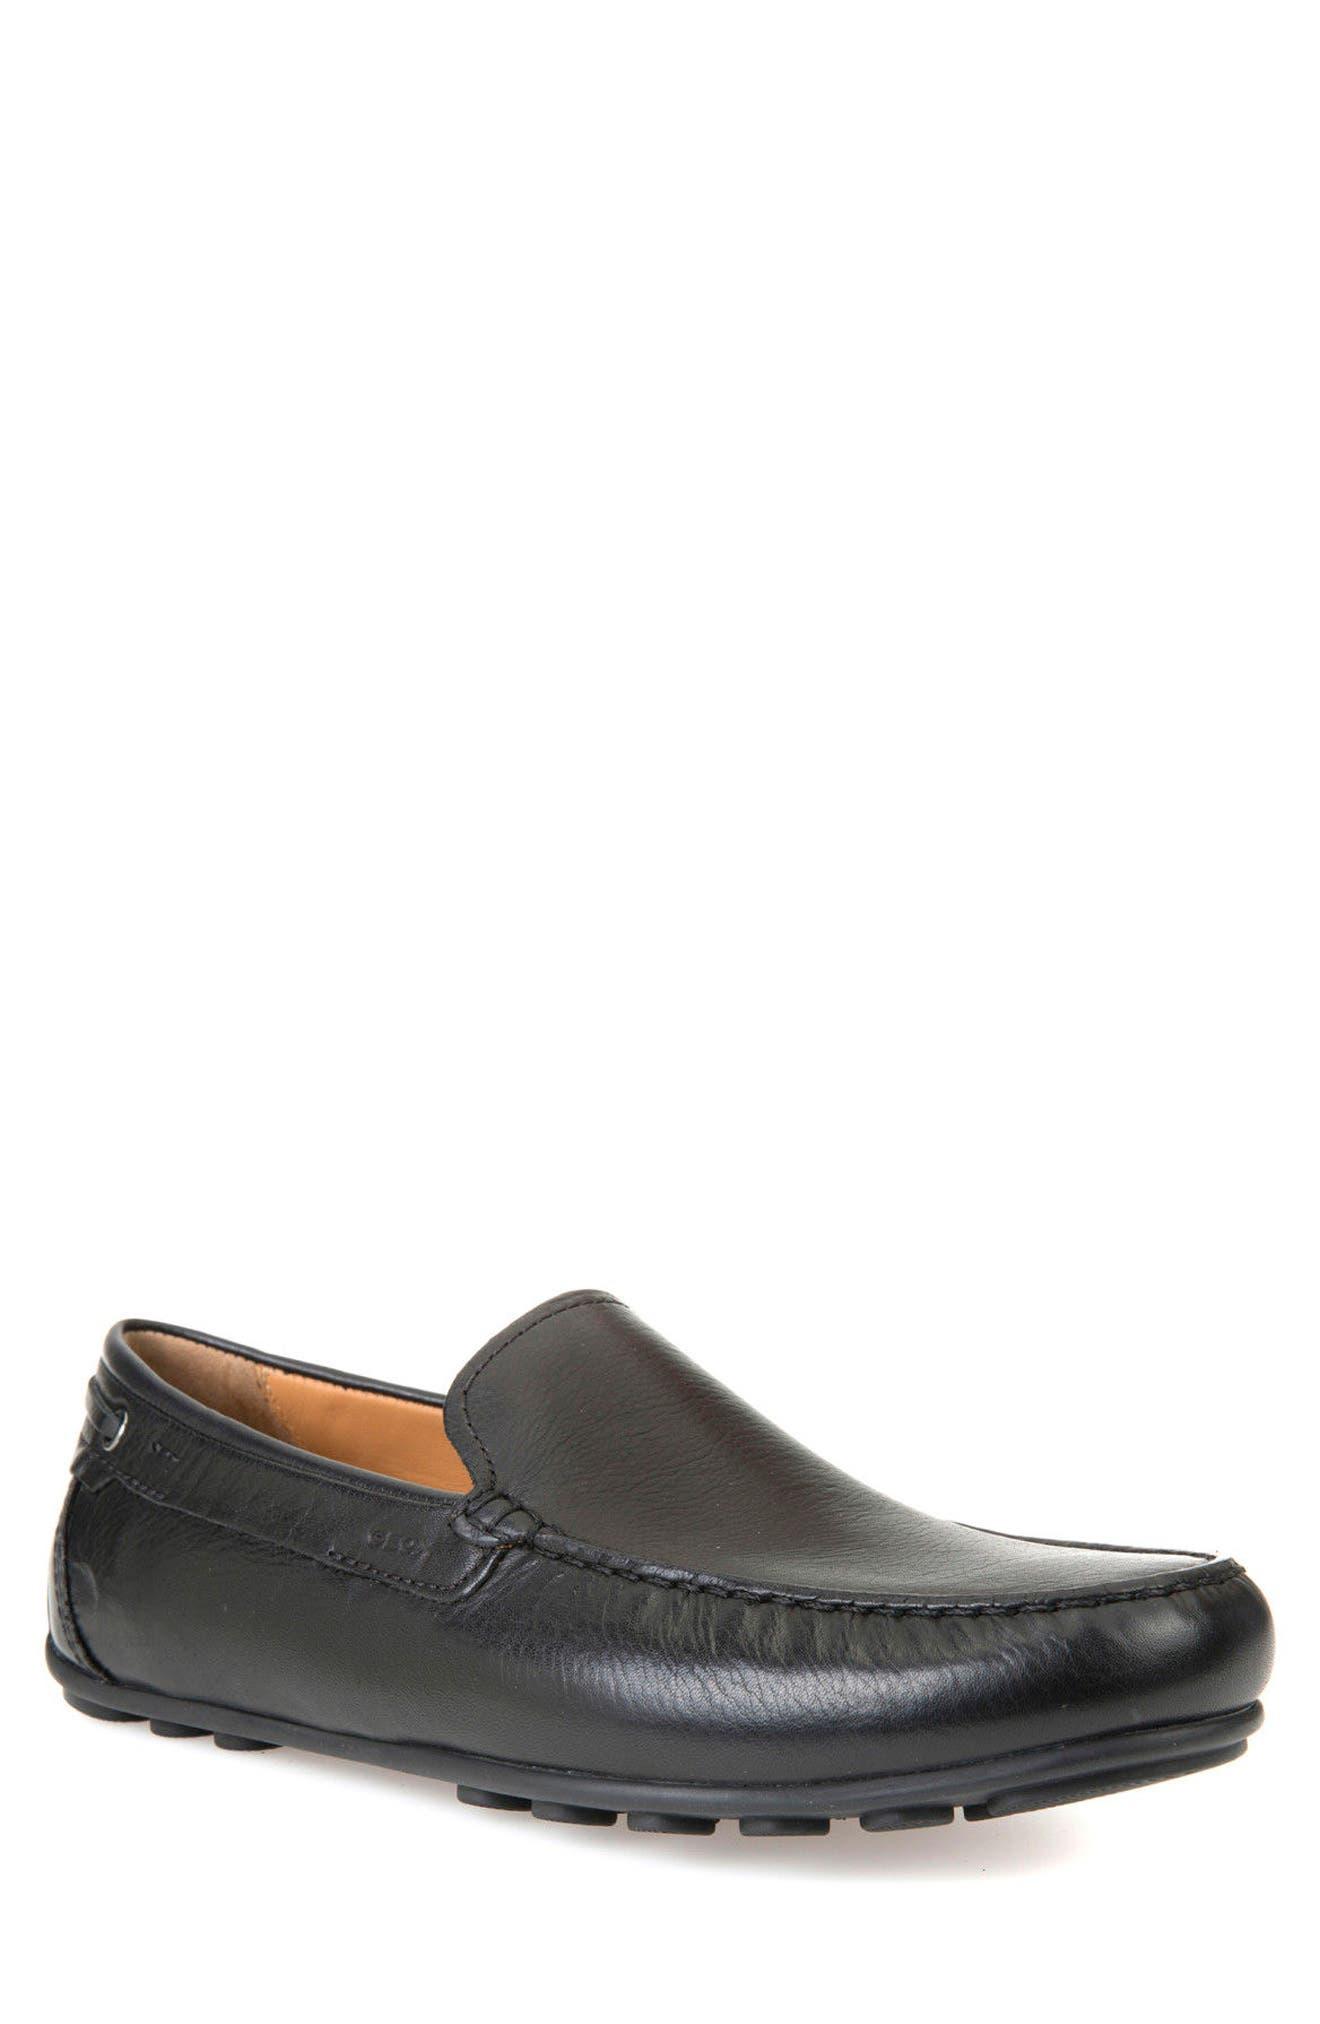 Giona 8 Driving Shoe,                             Main thumbnail 1, color,